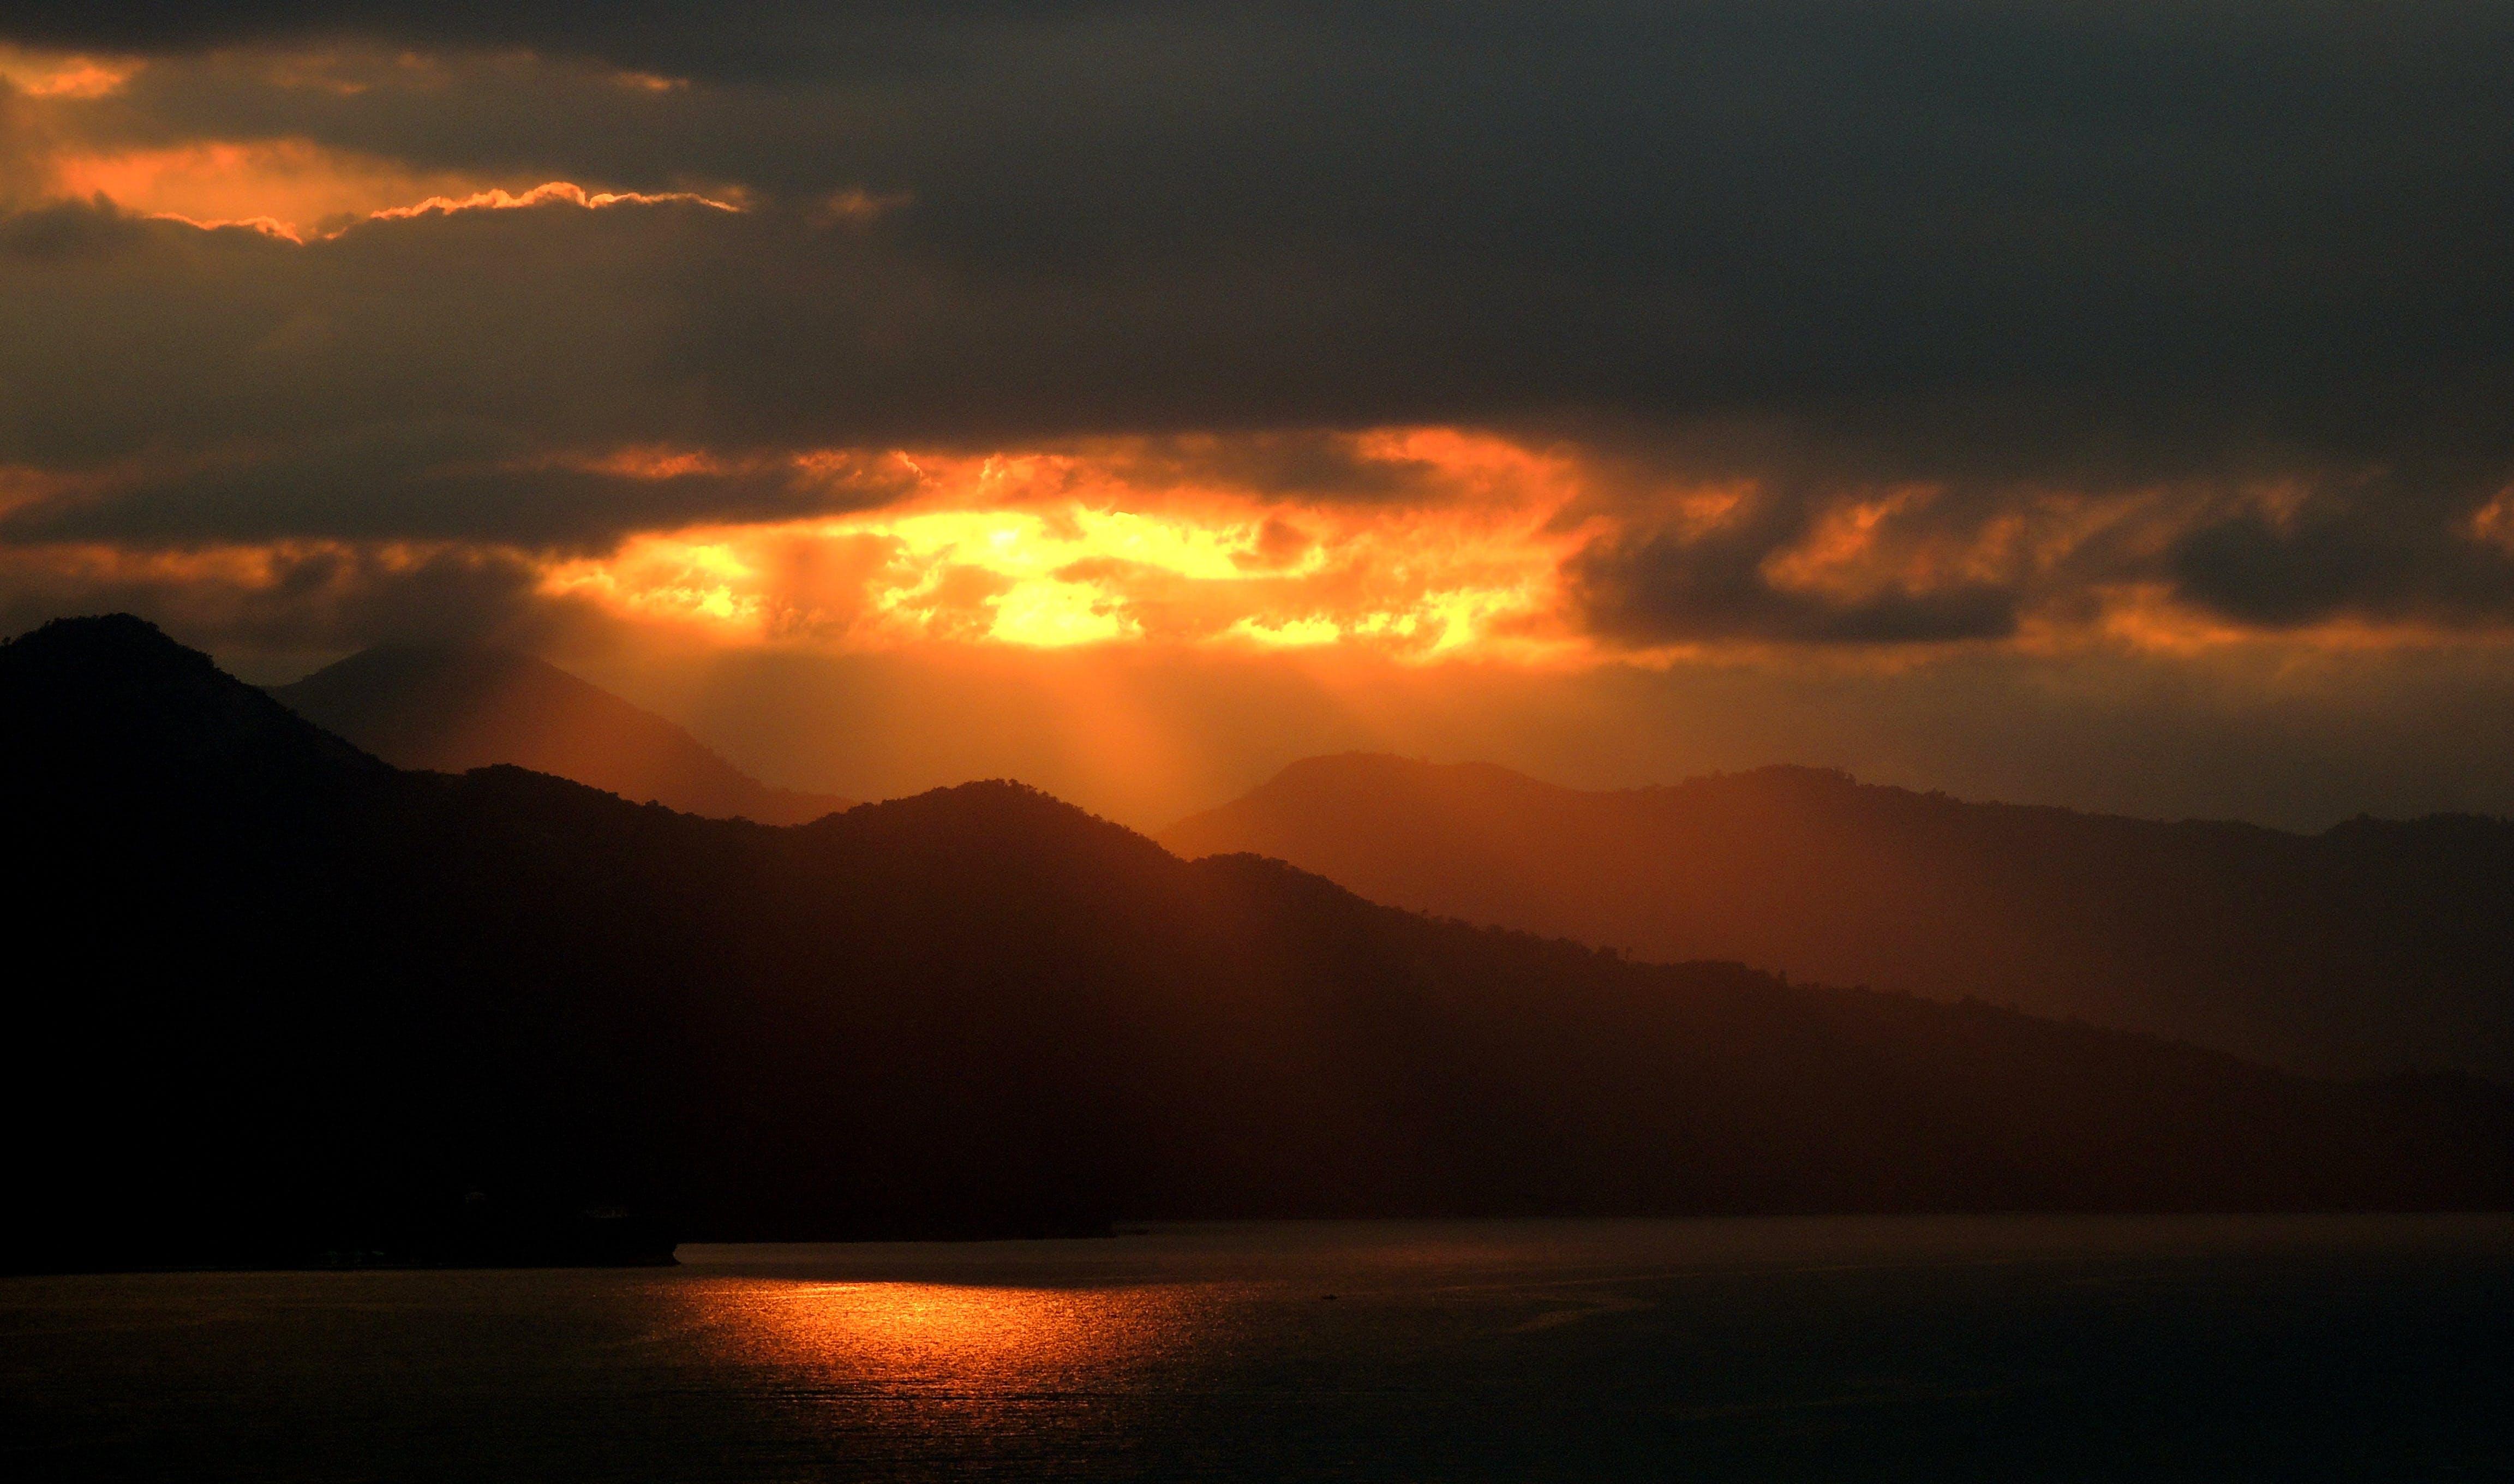 Mountain during Sunset Photograph